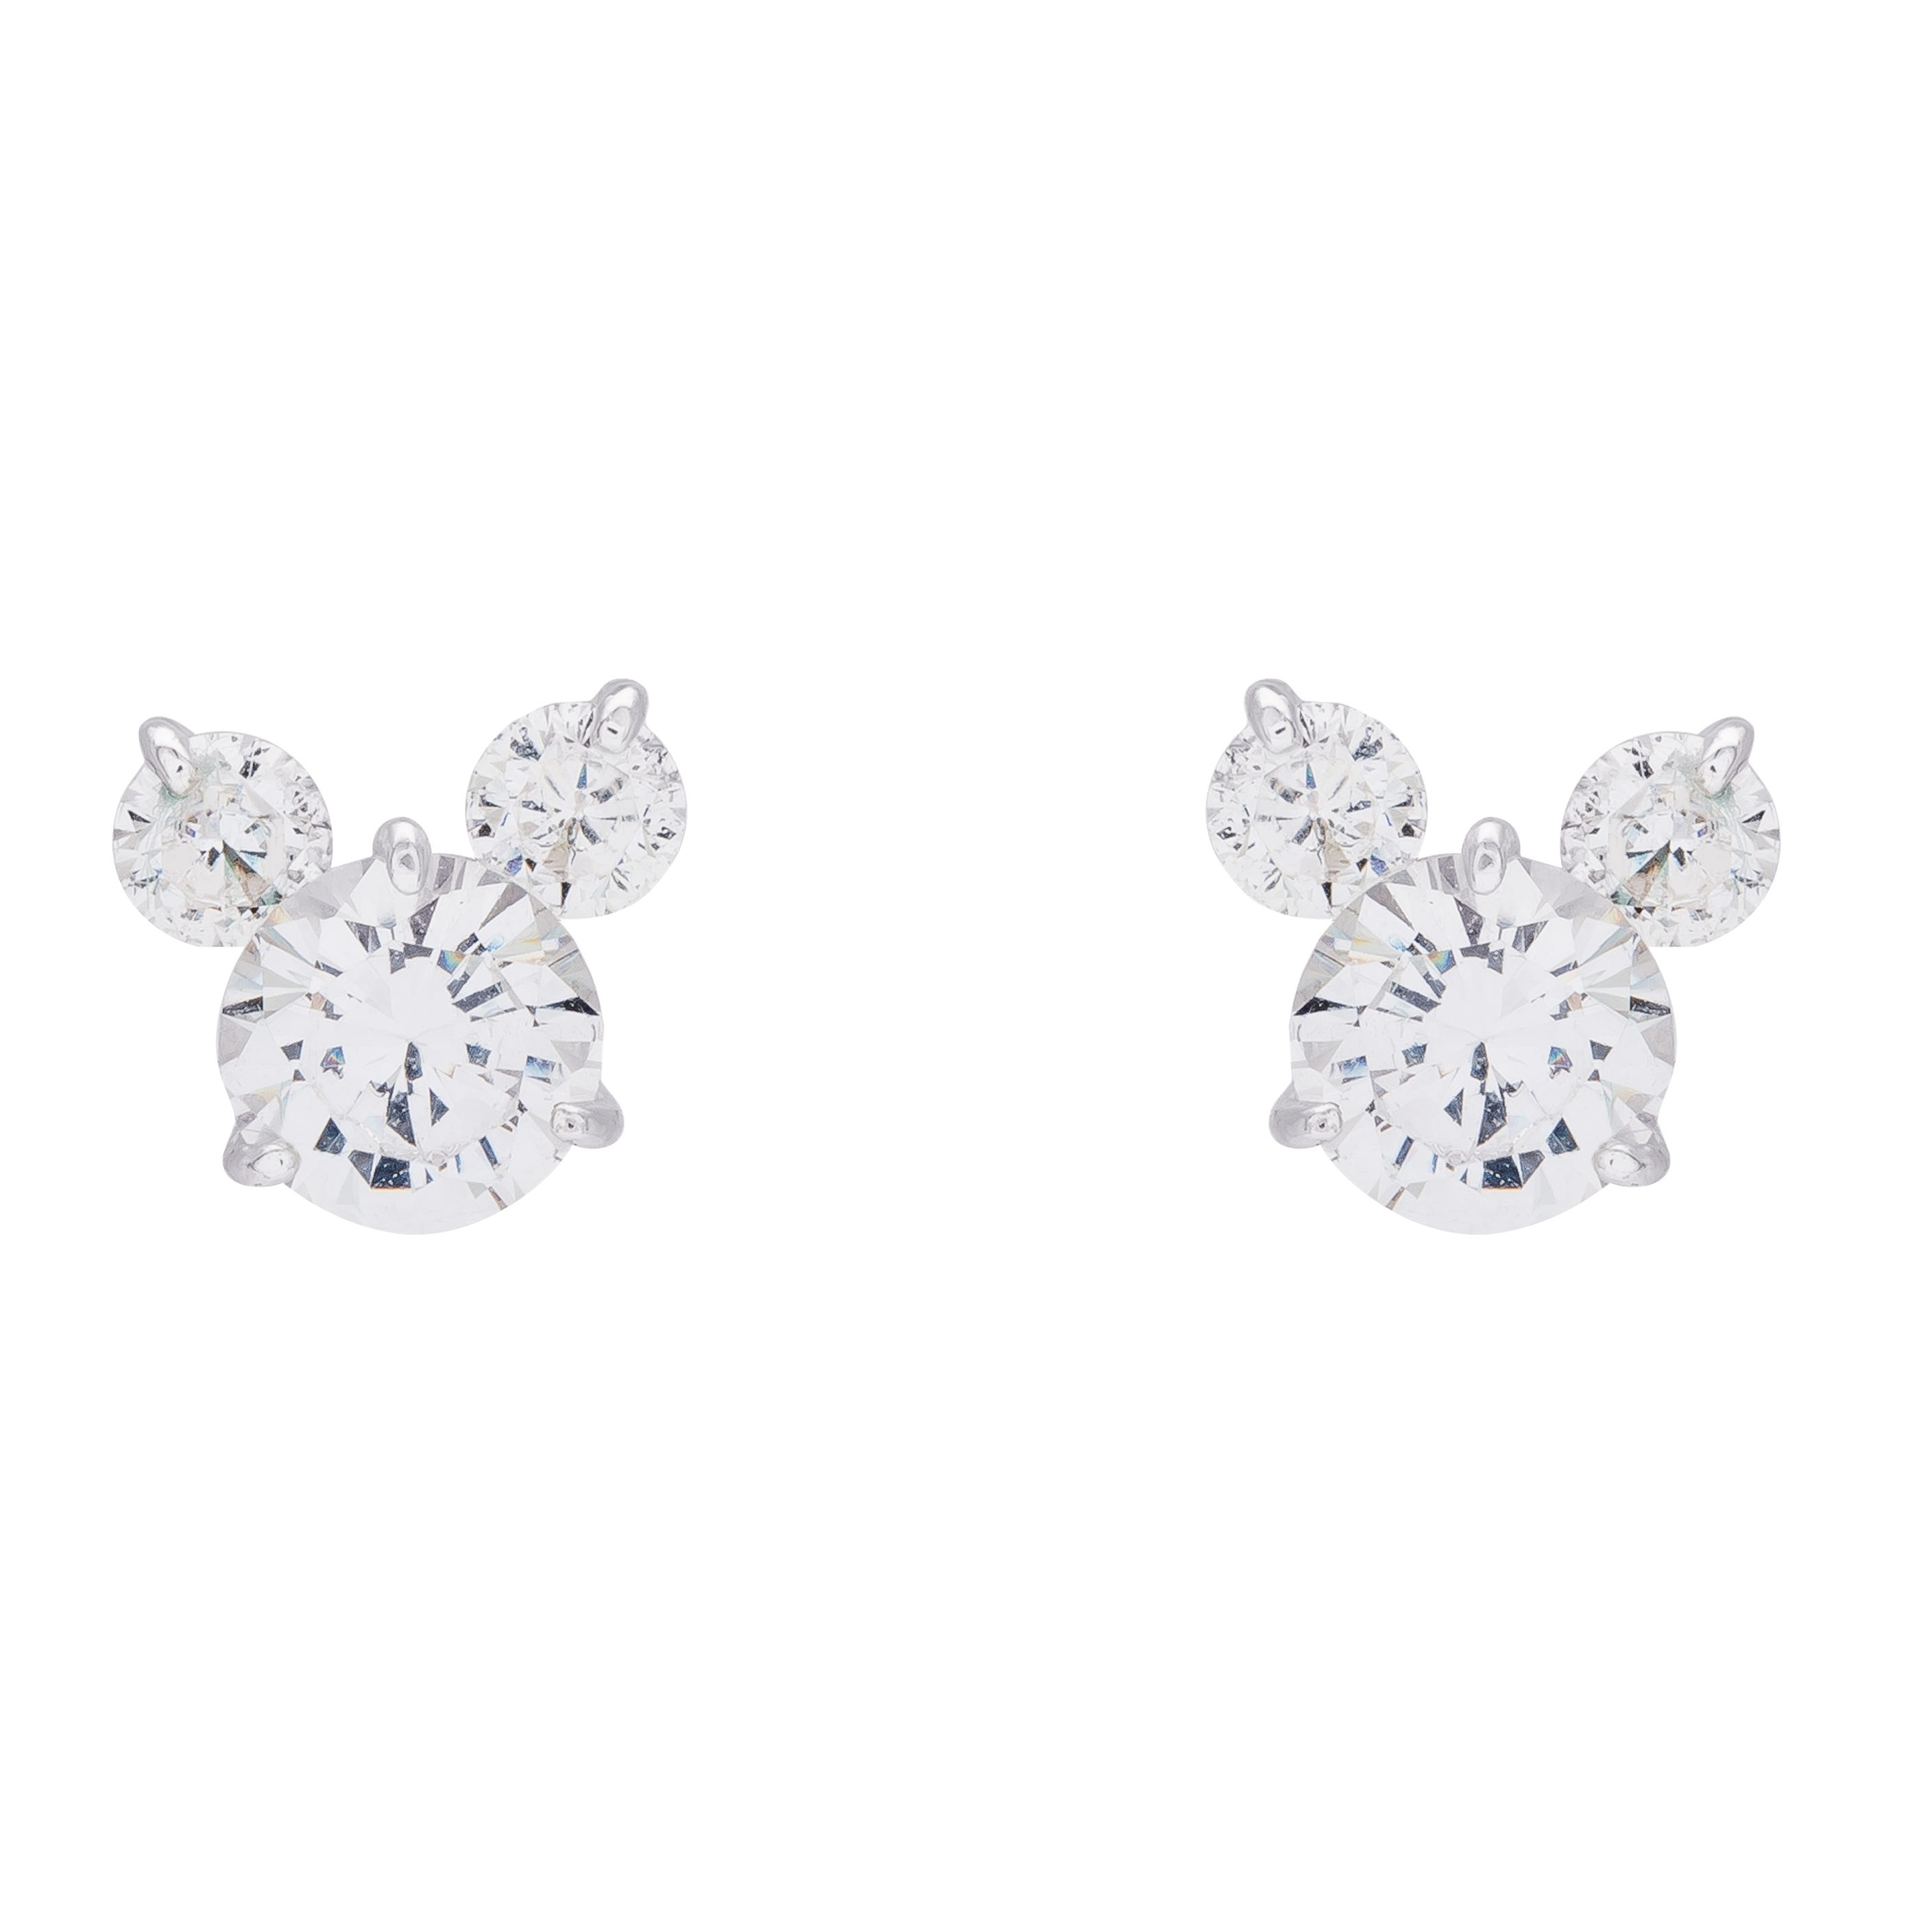 DISNEY© Mickey Mouse Silhouette CZ Stud Earrings in Sterling Silver